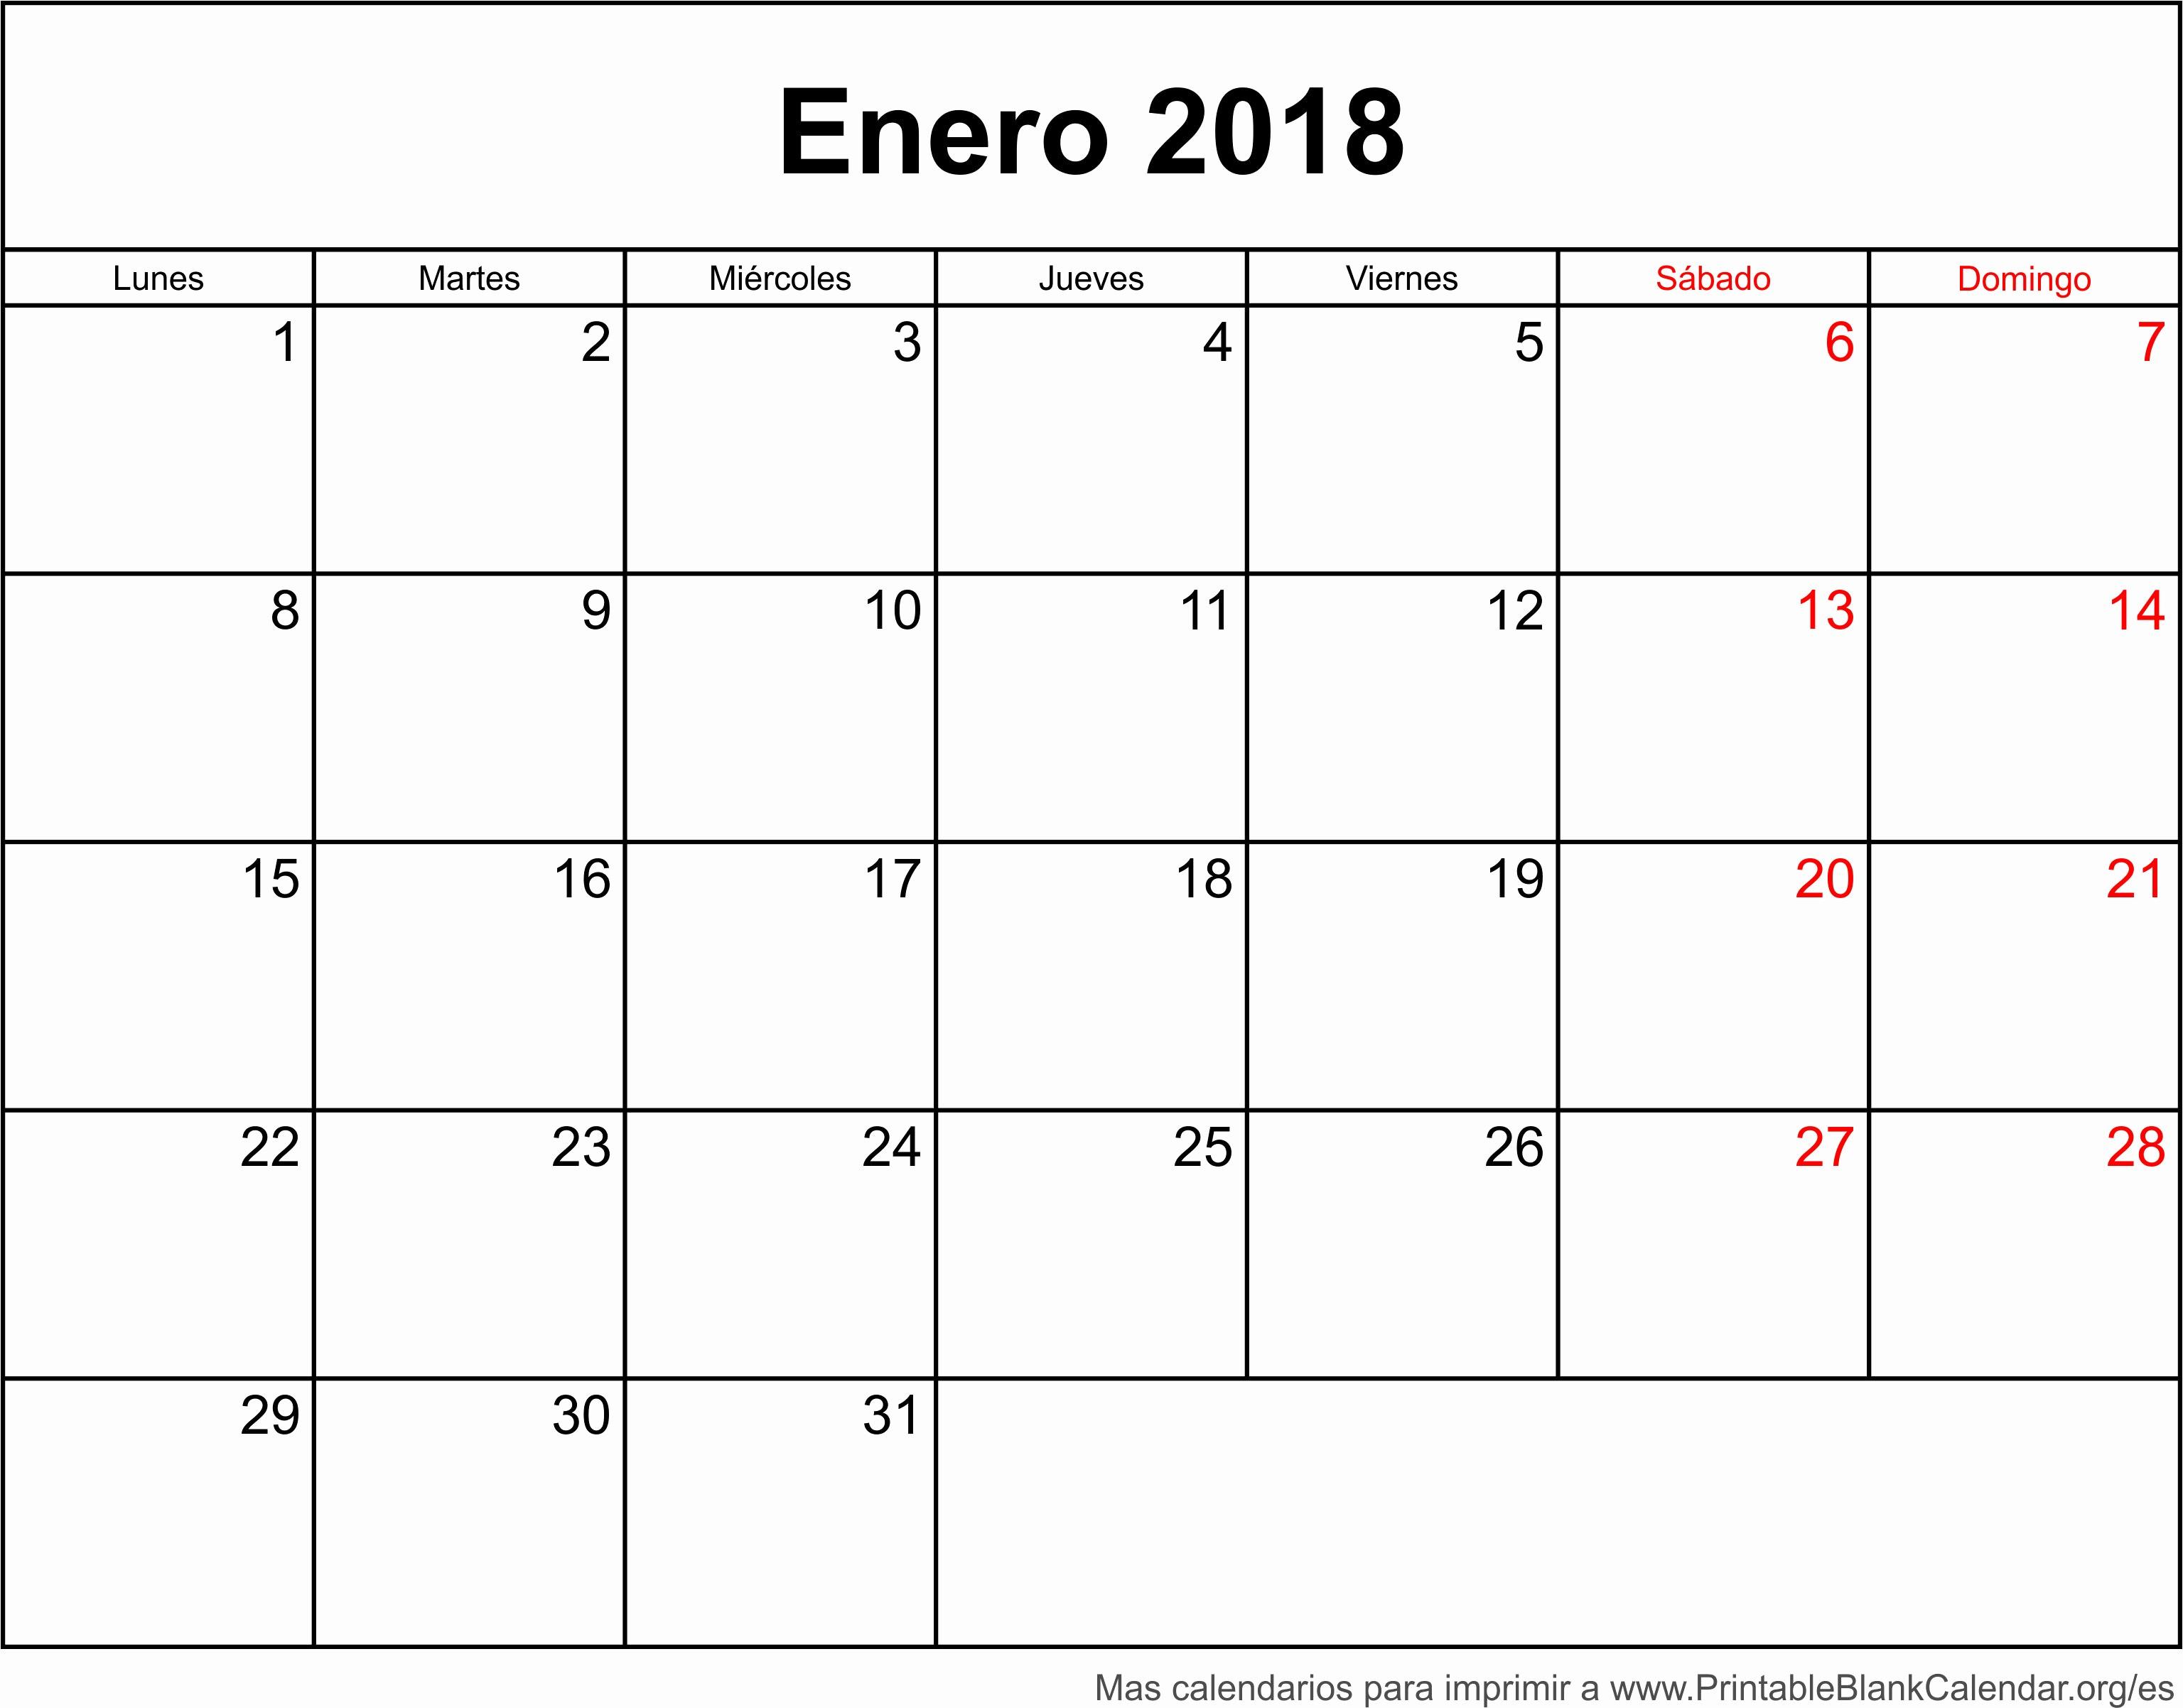 Calendario Diciembre 2017 Para Imprimir Awesome Enero Calendario 2018 Related Keywords Enero Calendario